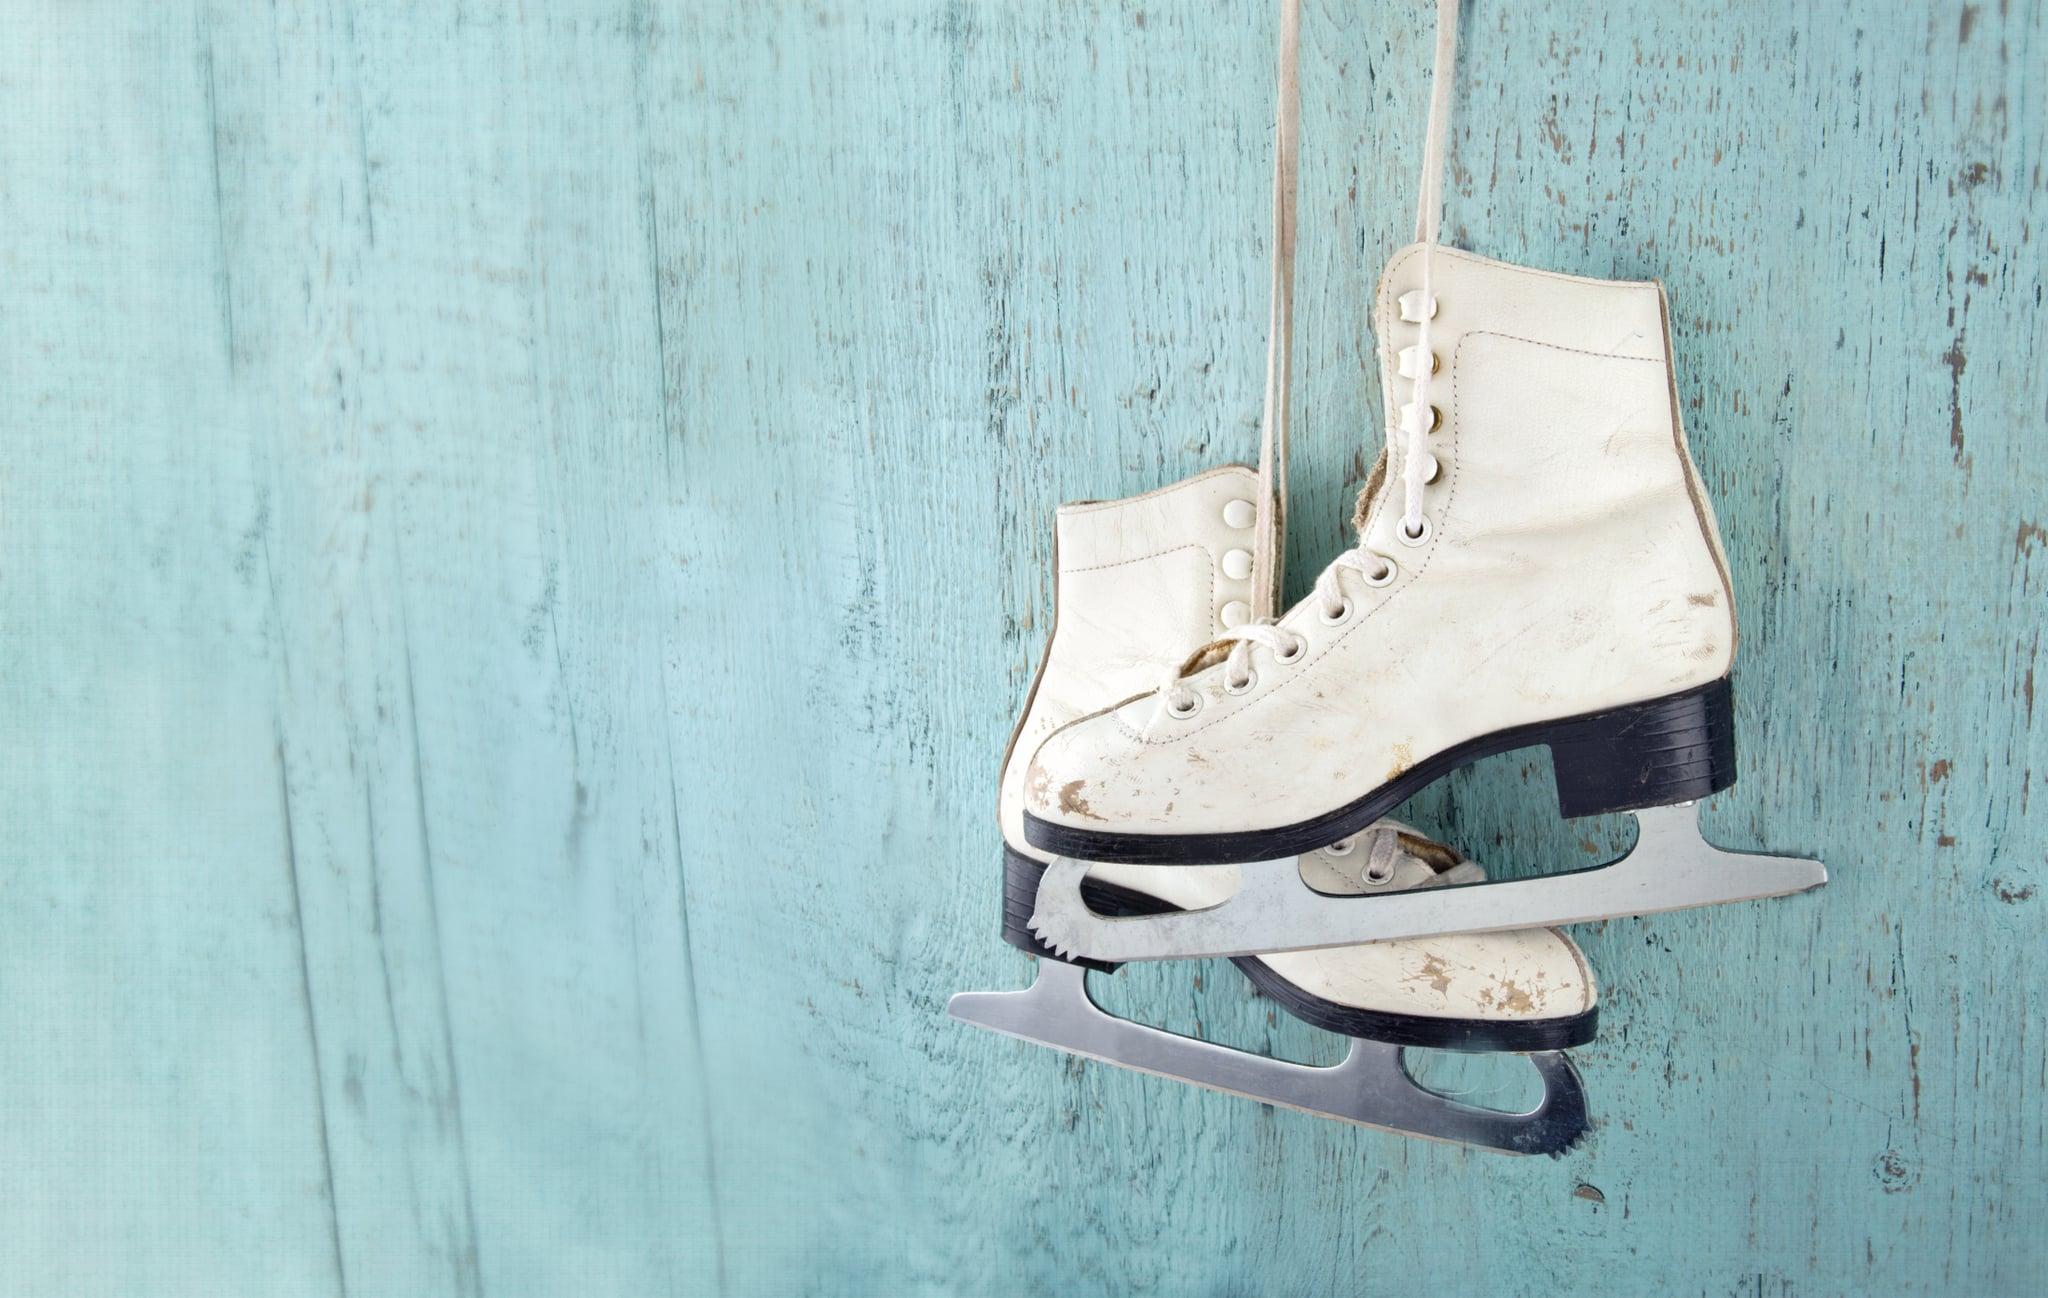 Skate Ramp Parts